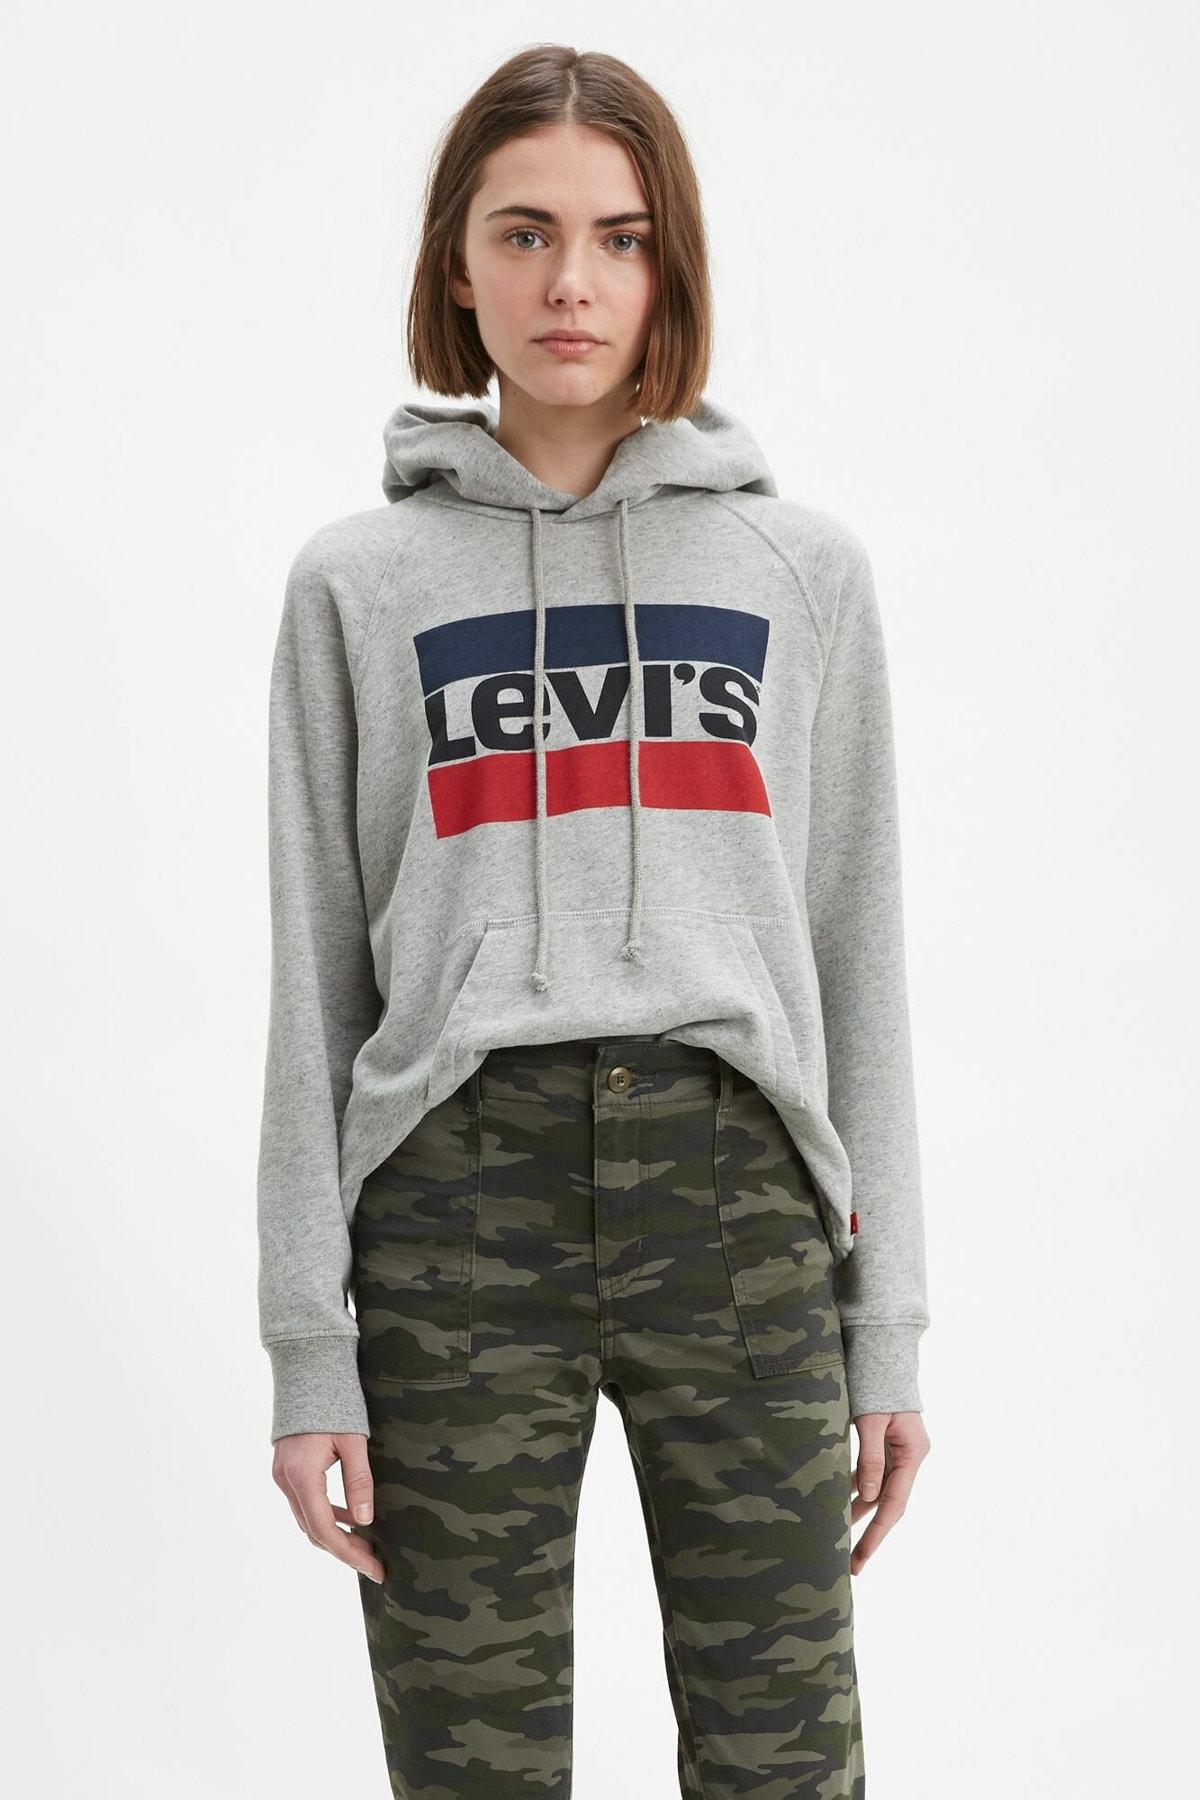 Levi's Kadın Kapüşonlu Gri Sweatshirt 35946-0111 1